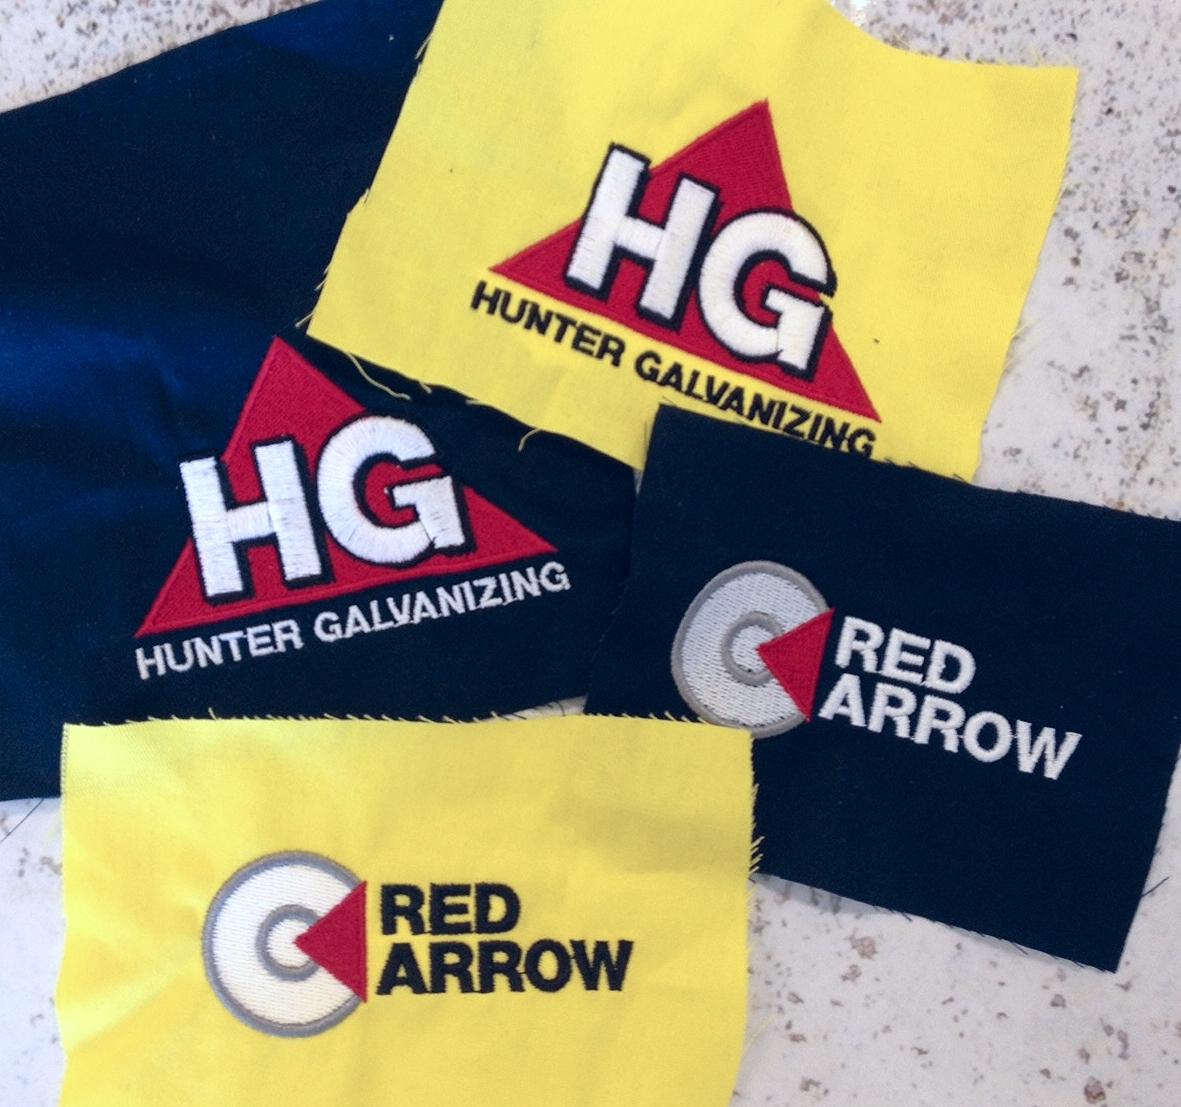 Hunter Galvanizing new uniforms logos